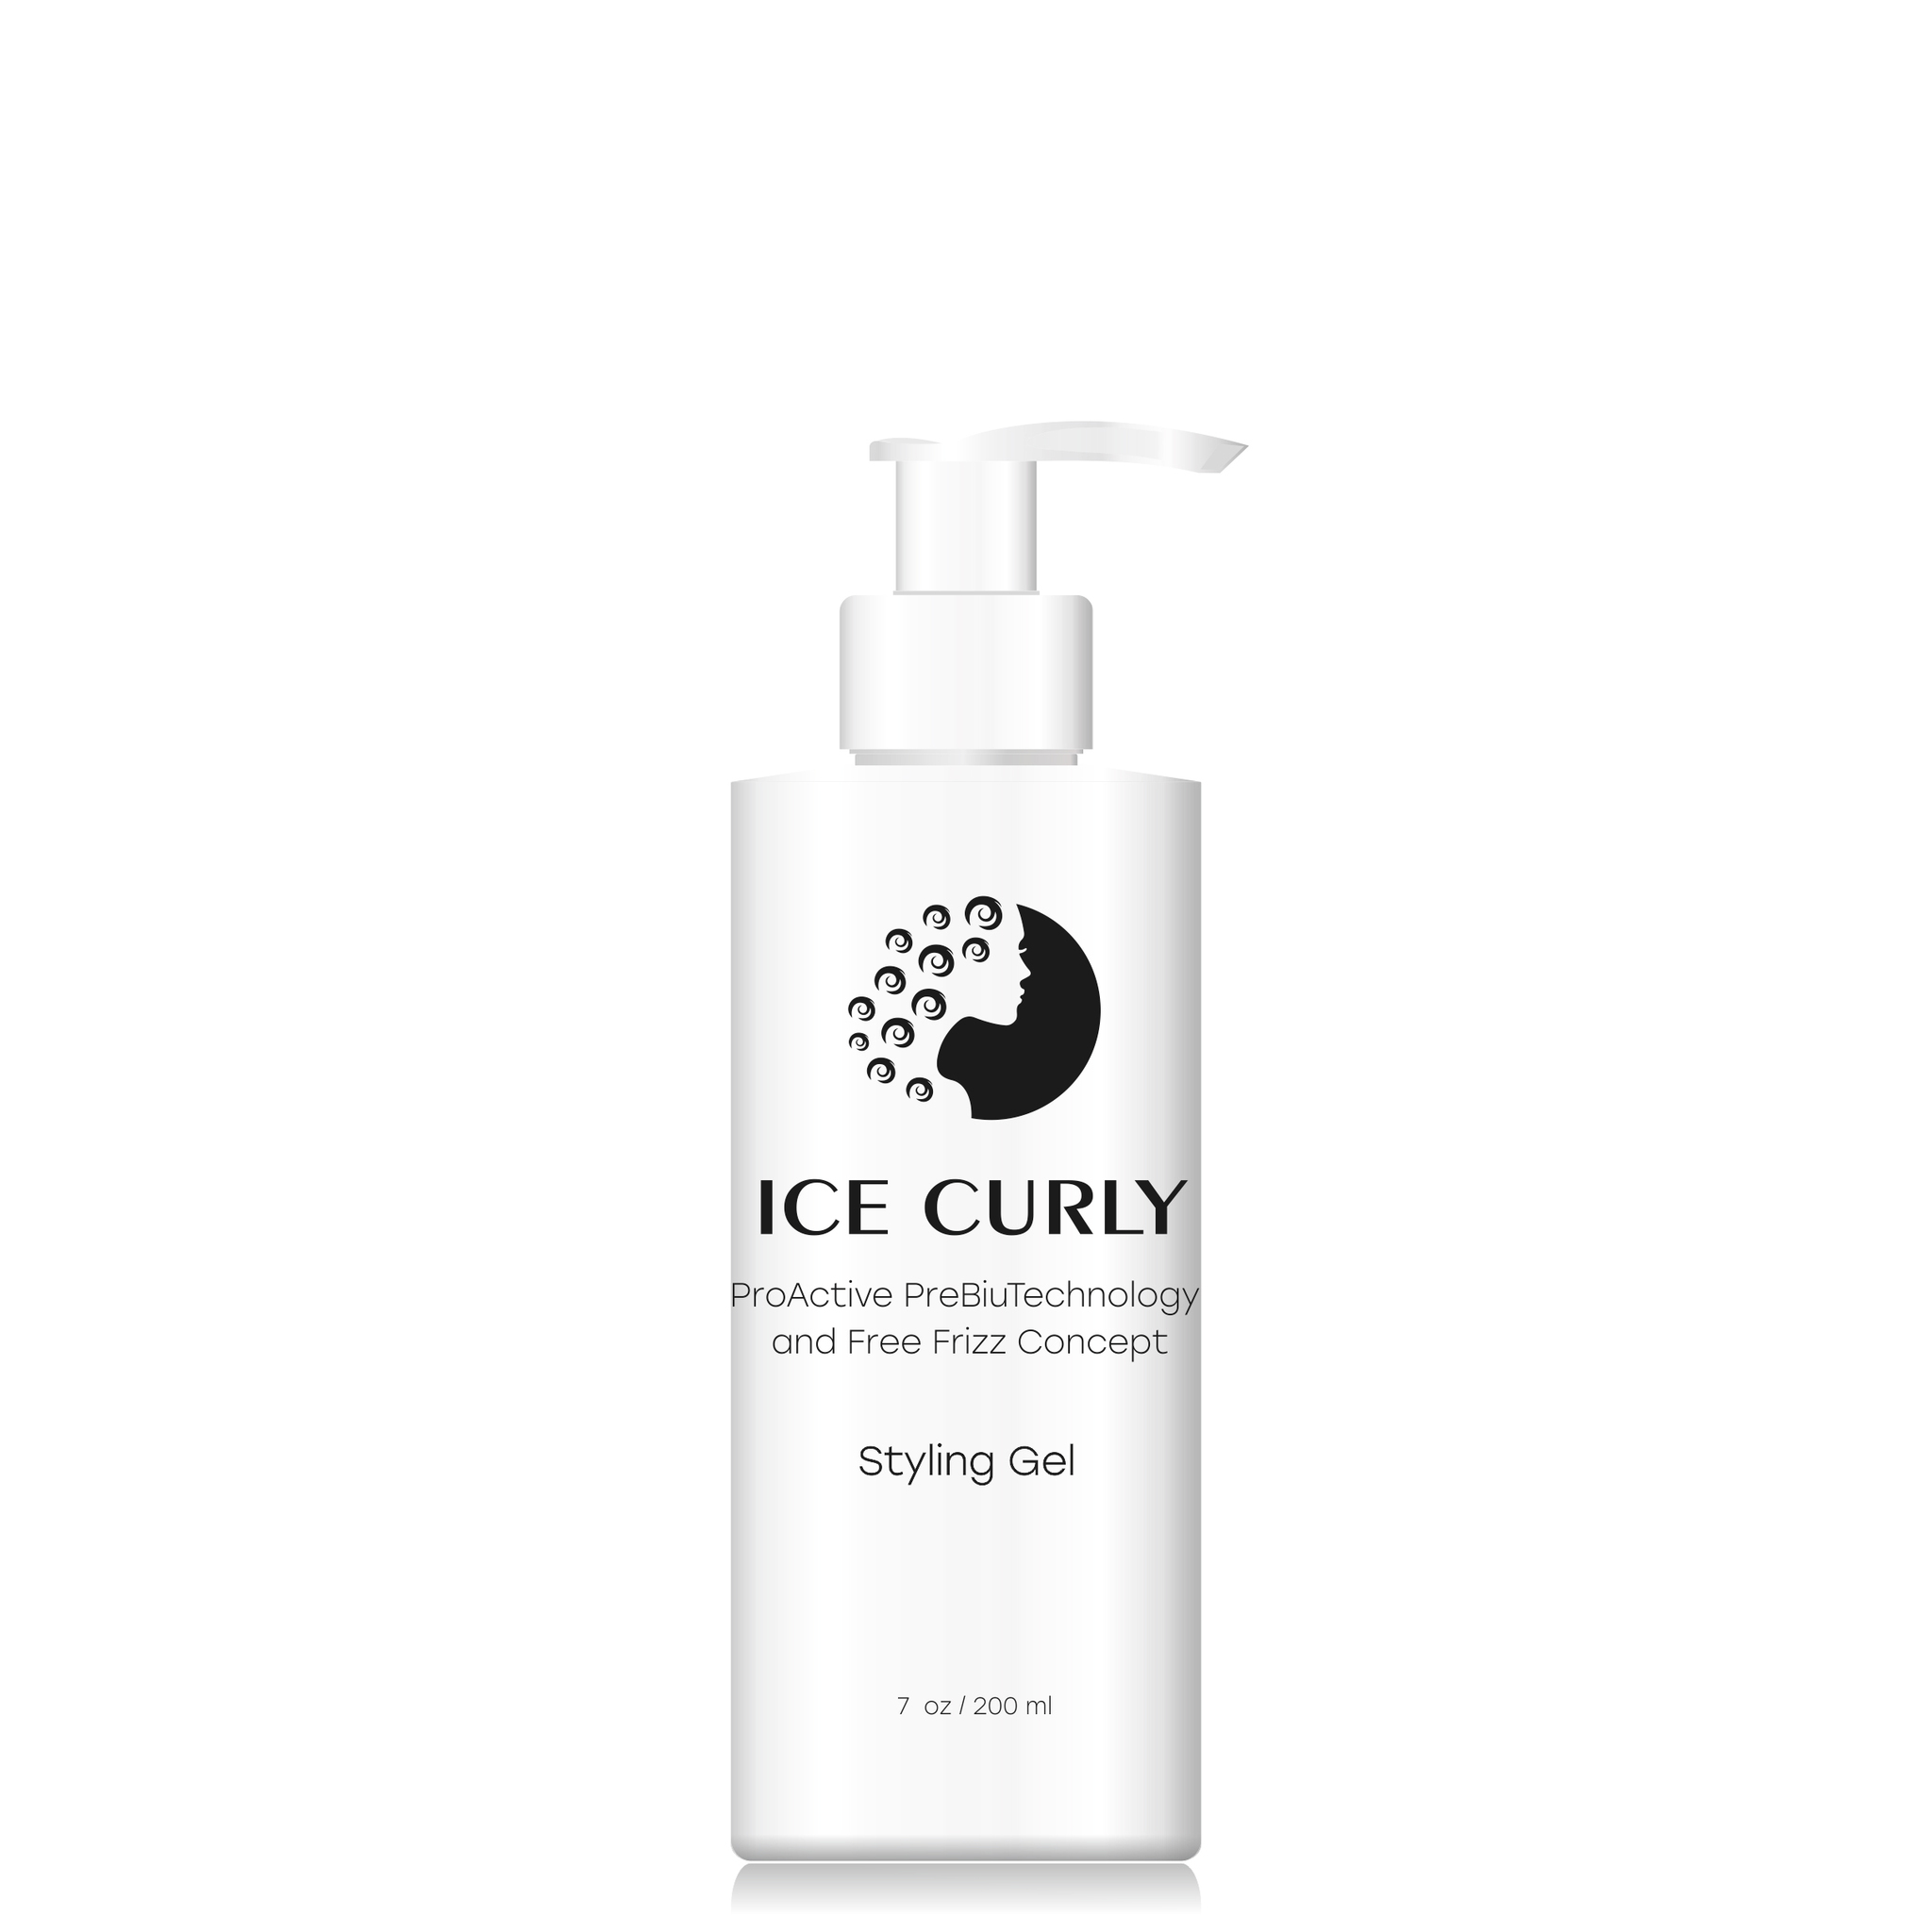 ICE CURLY, гель для укладки волос, для кудрявых волос, ProActive PreBiuTechnology and Free Frizz Concept Styling Gel